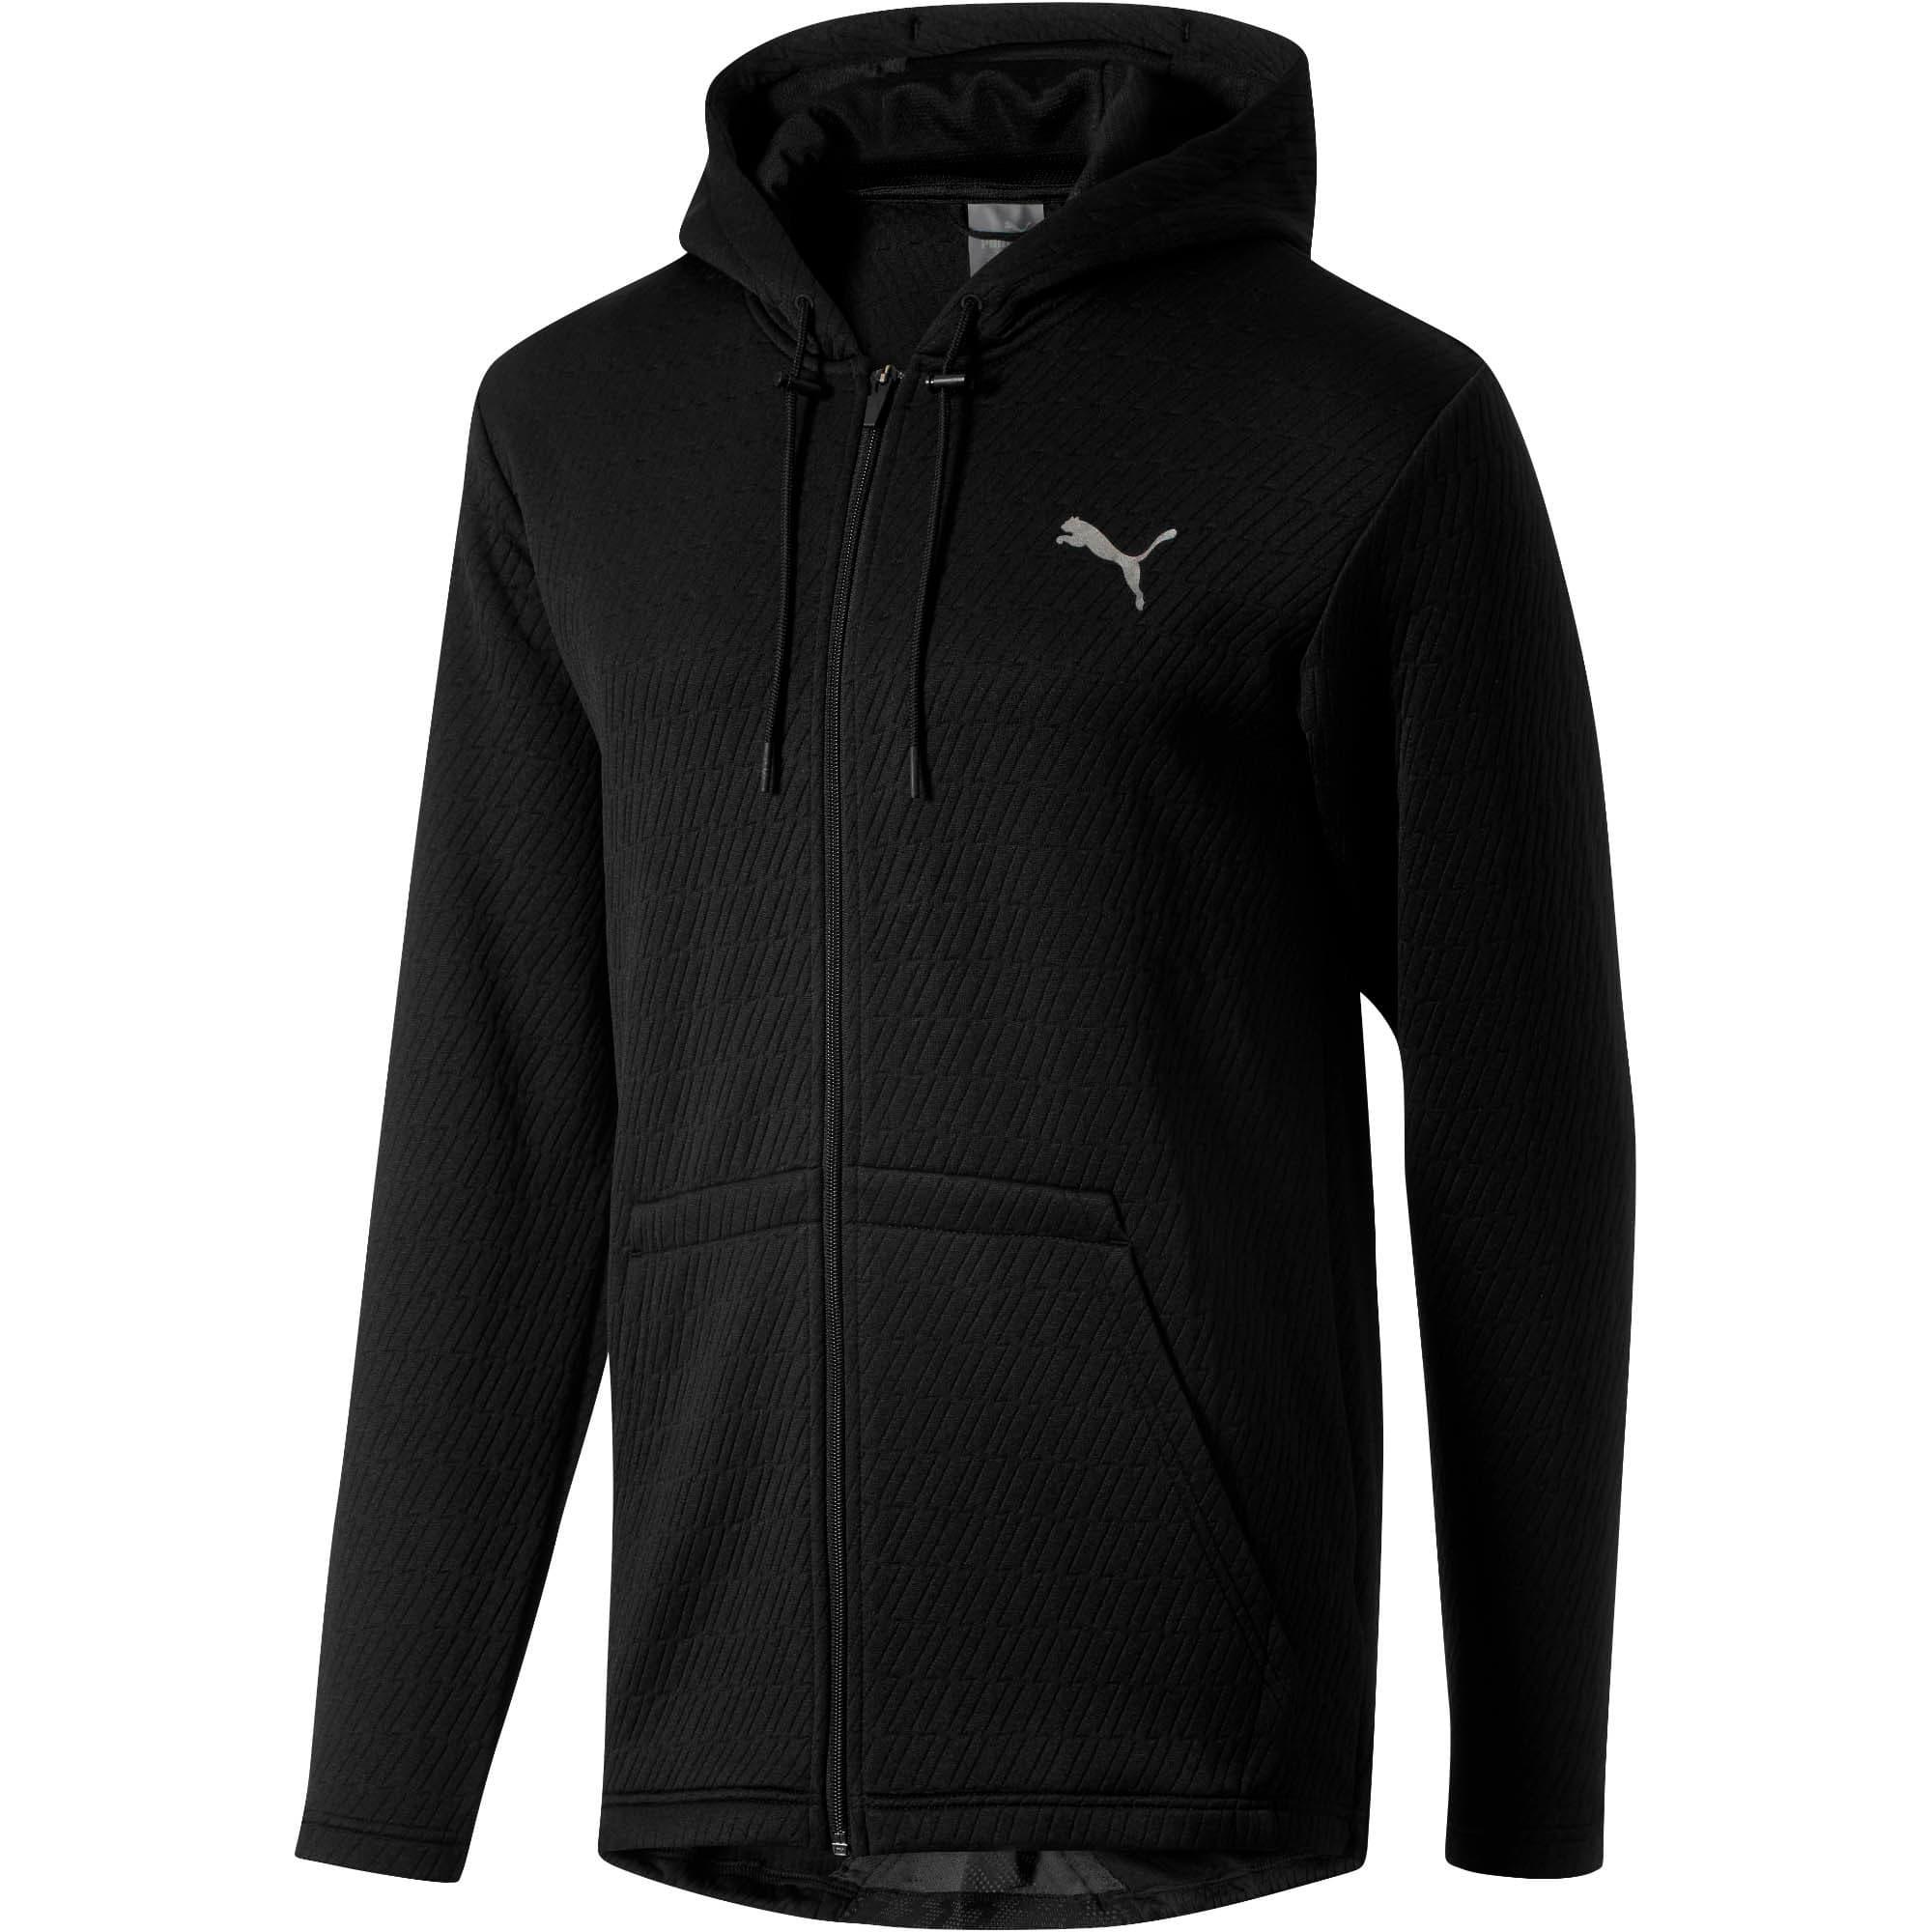 Thumbnail 1 of VENT Hooded Jacket, Puma Black, medium